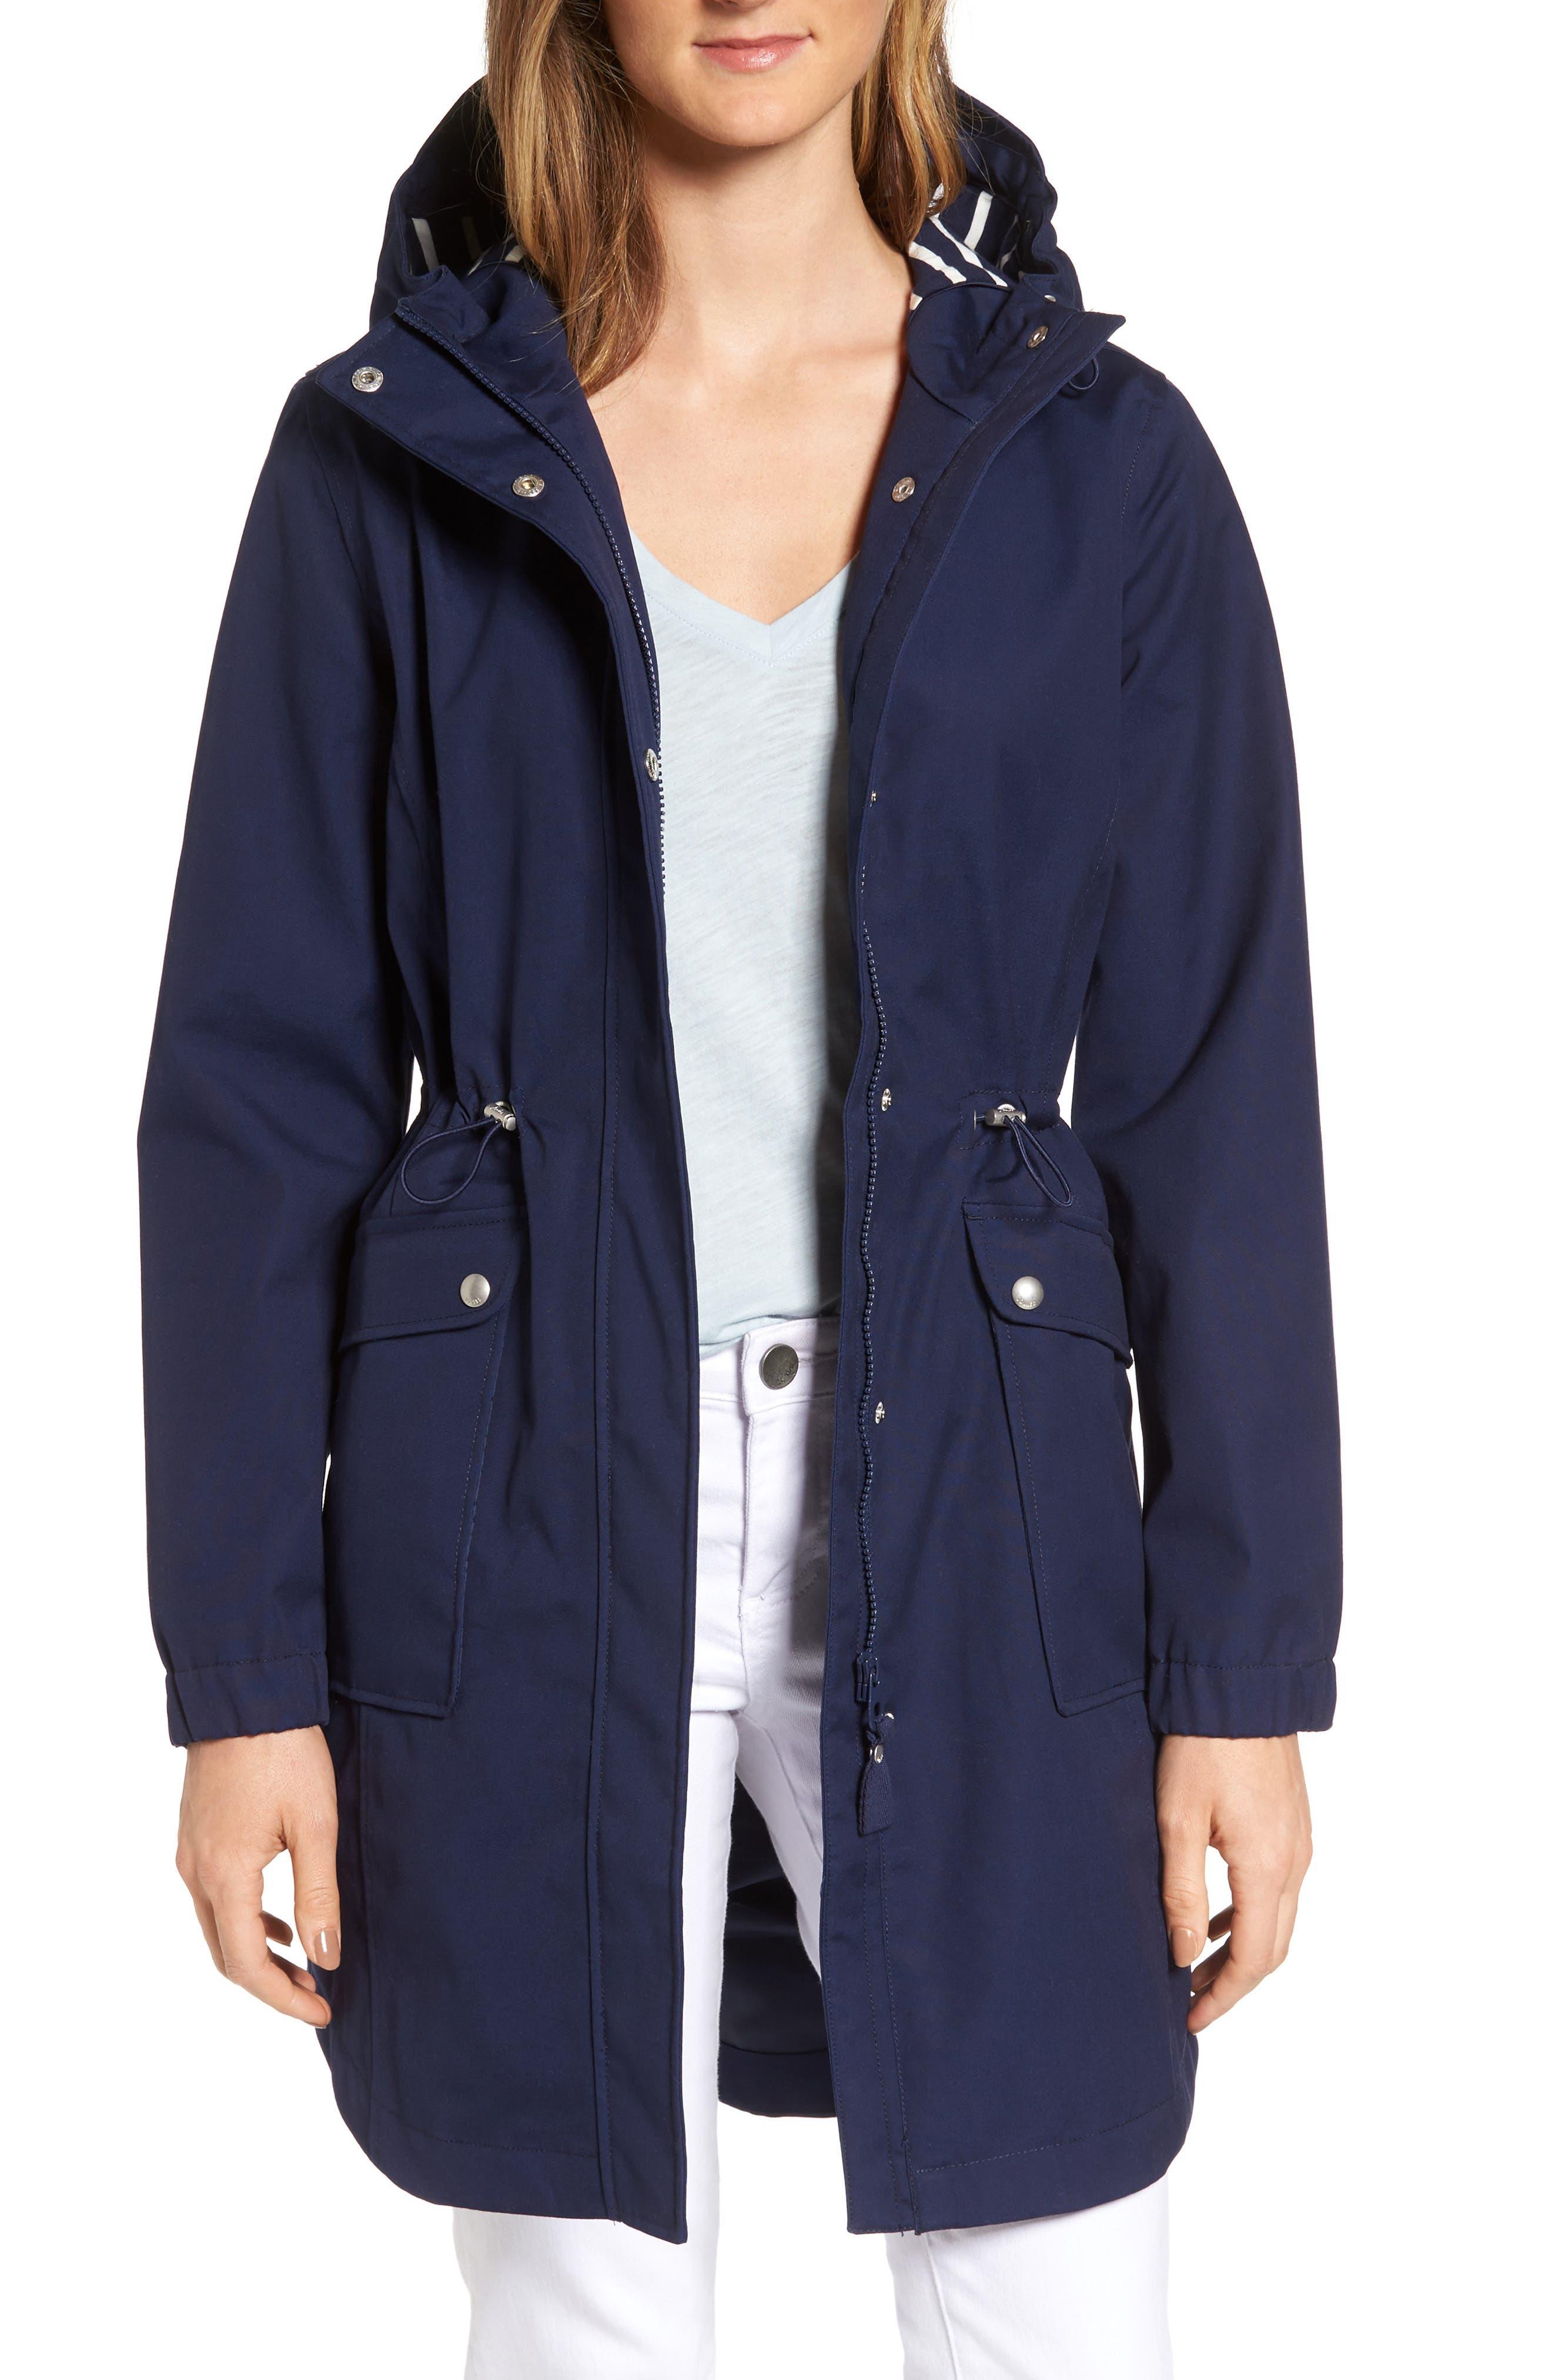 Right as Rain Waterproof Hooded Jacket,                             Main thumbnail 1, color,                             411